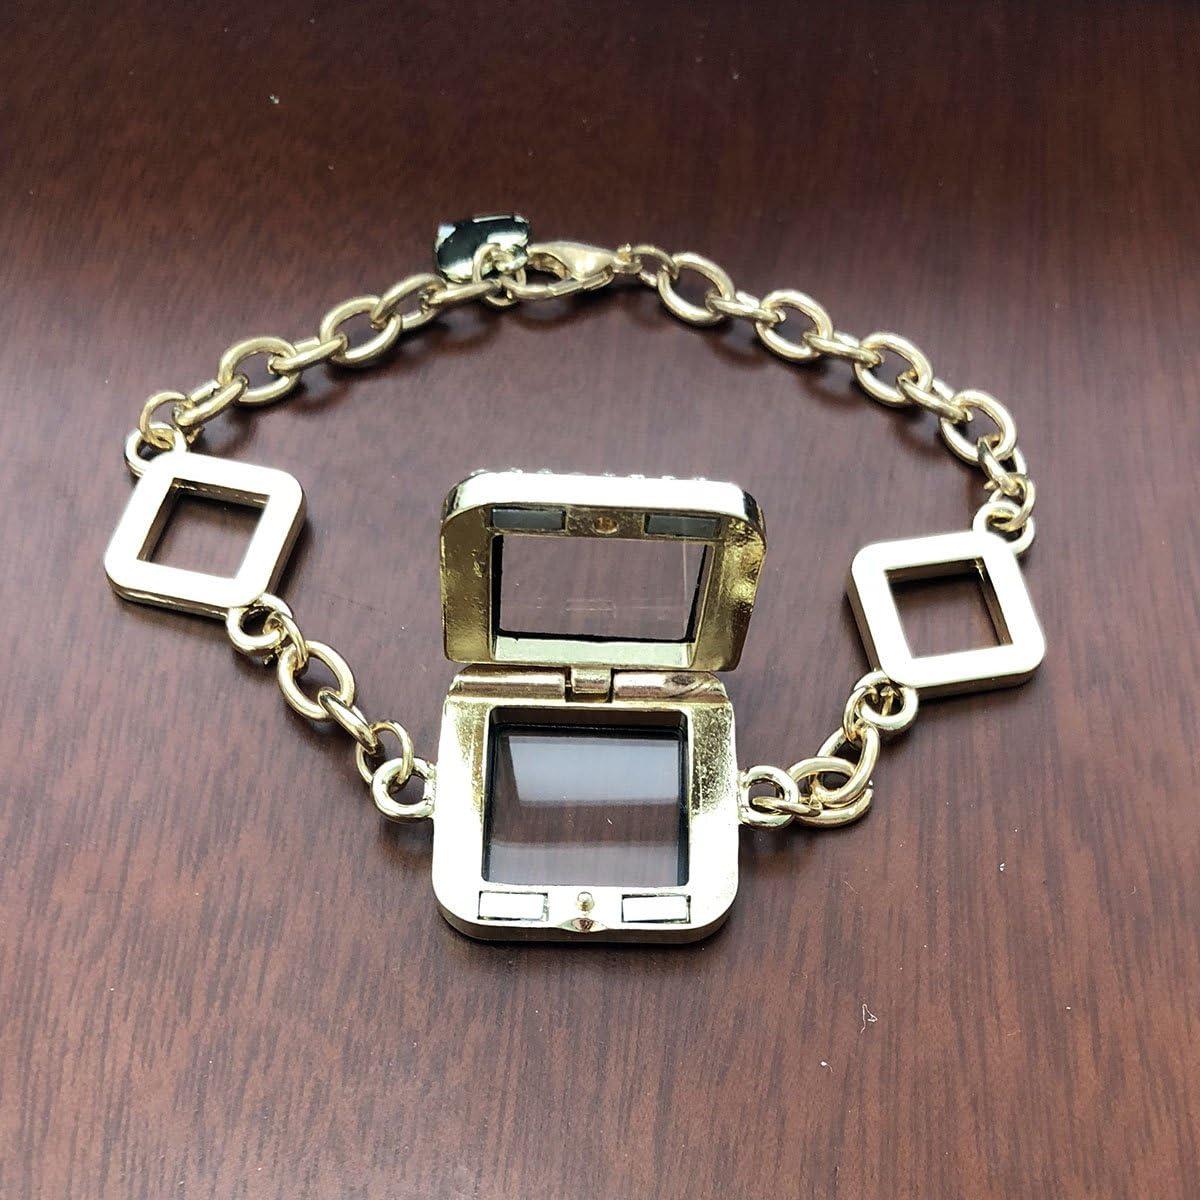 MayLove Rhinestone Floating Bracelet Glass Locket Living Memory Bangle Link Locket Charm Sqaure Shape